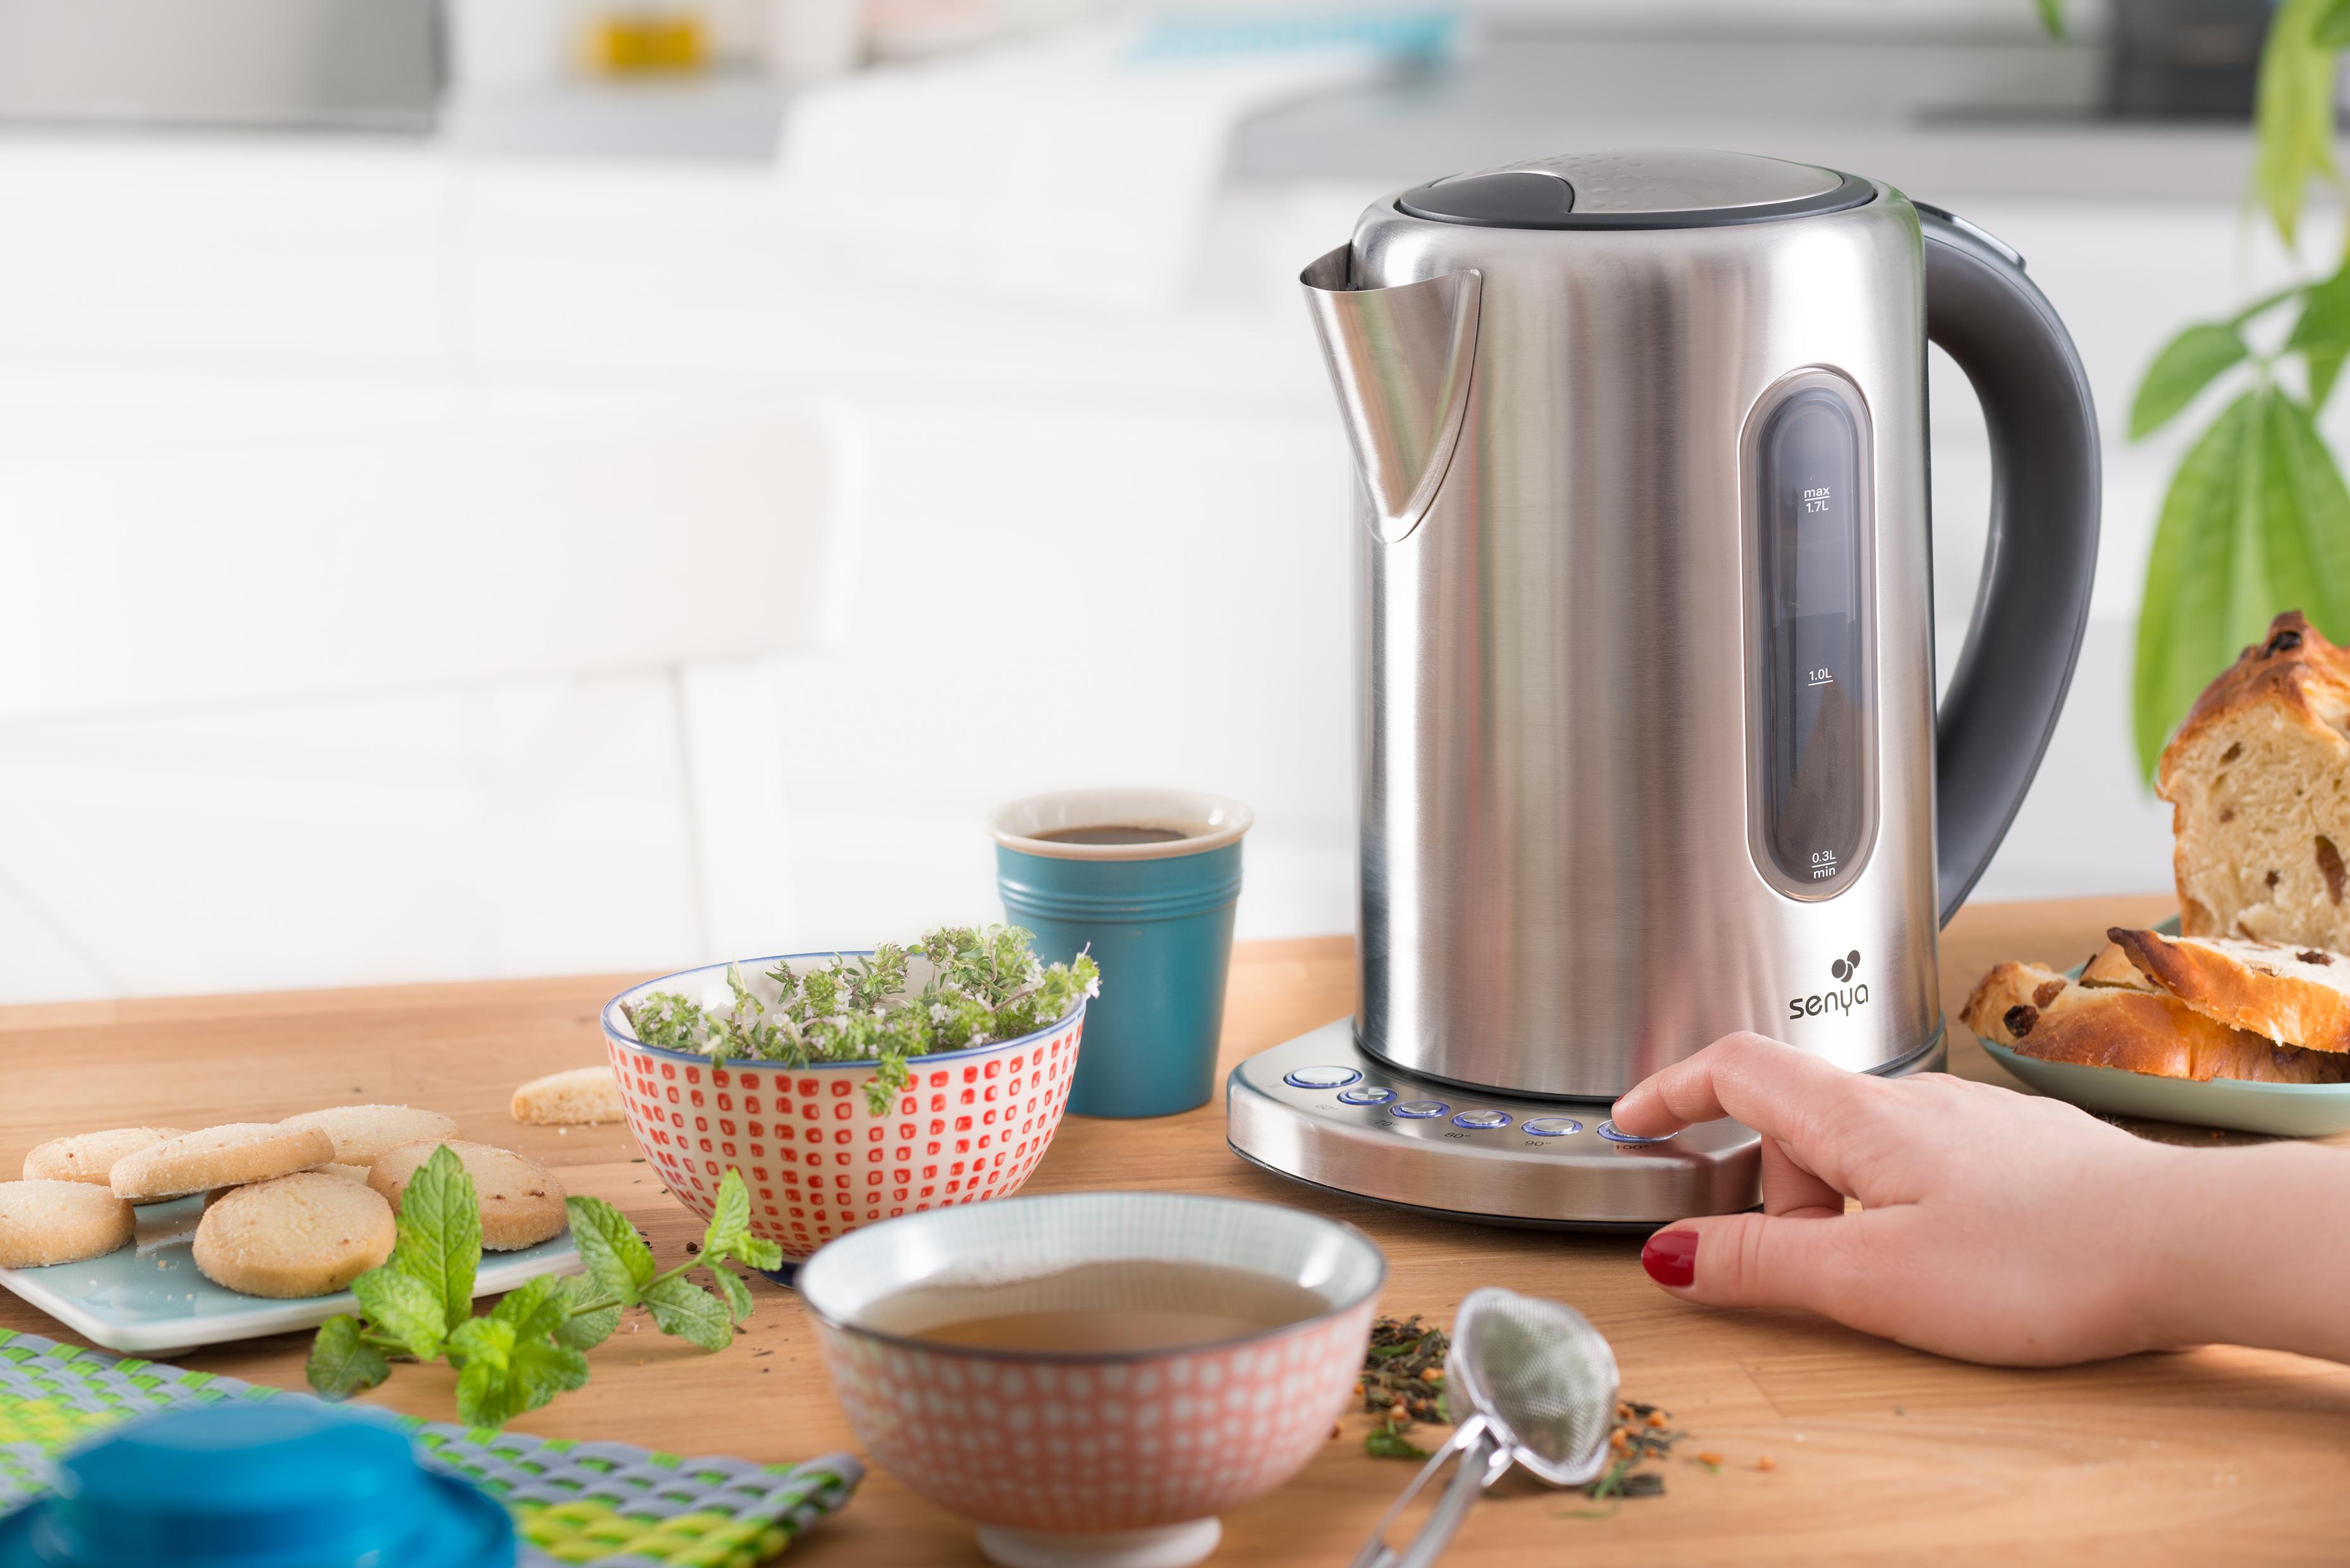 Bouilloire r glage de temp rature inox tea touch senya - Bouilloire inox temperature reglable ...